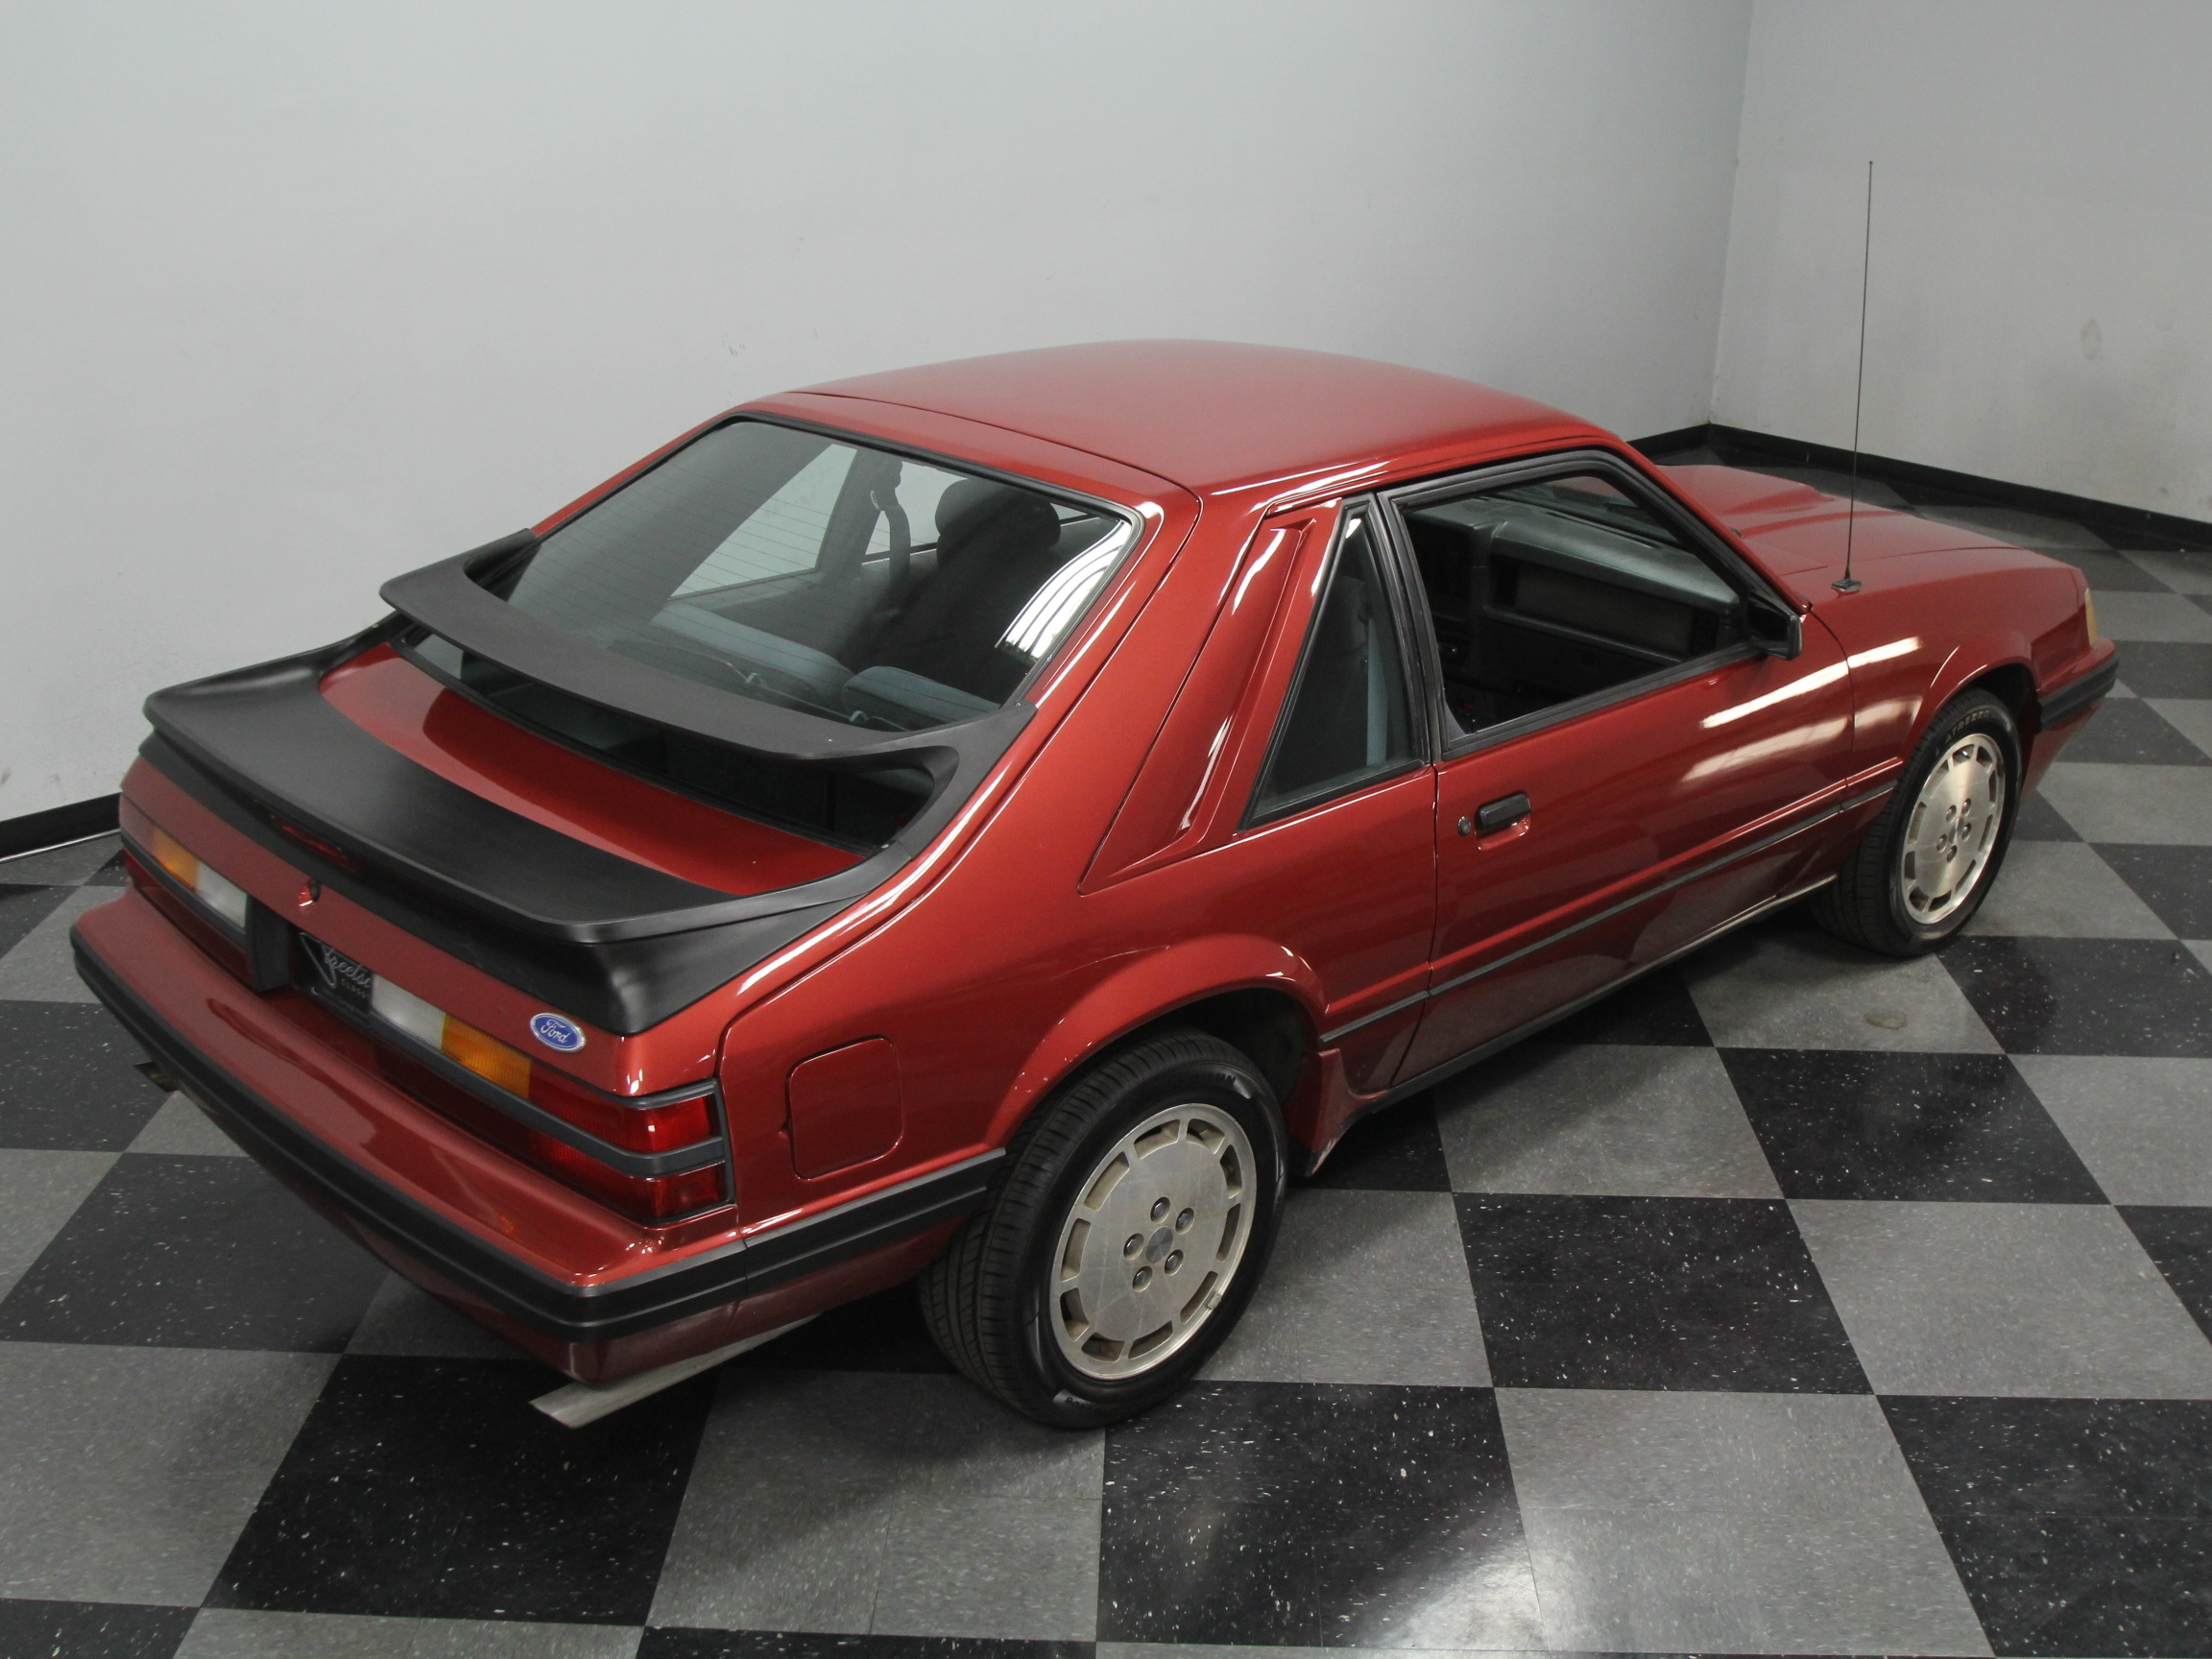 3343-CHA | 1986 Ford Mustang SVO | Streetside Classics